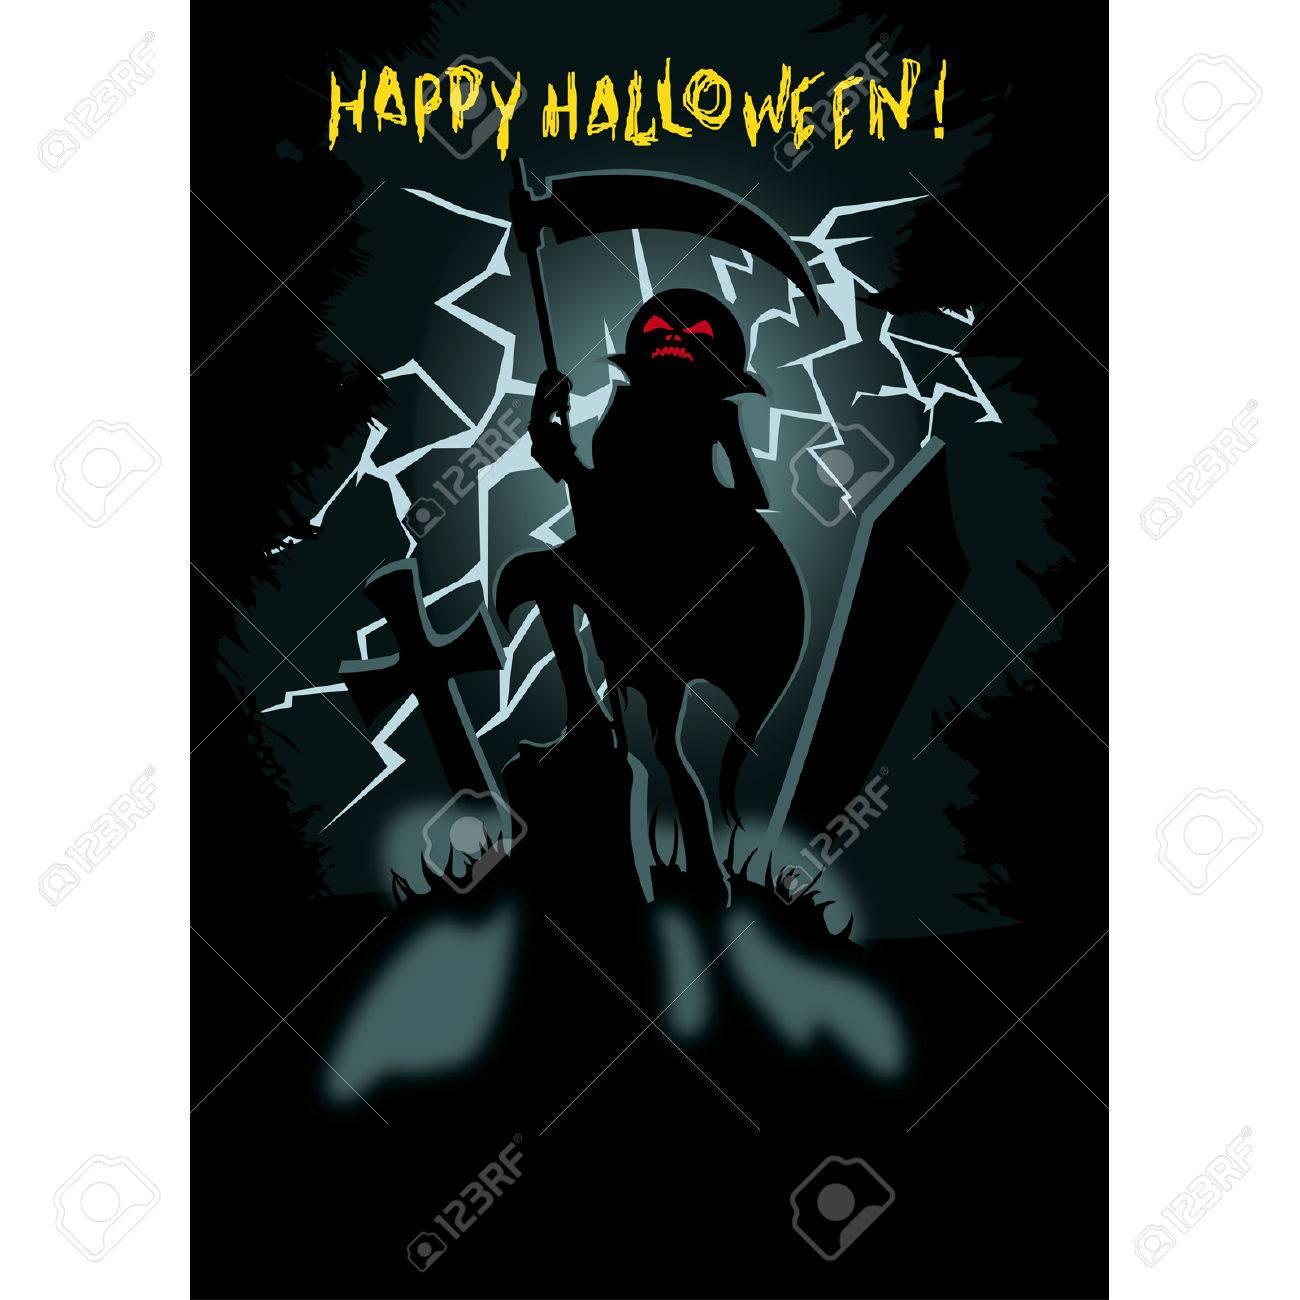 Halloween Poster With Siluette Pumpkin Head Jack The Scythe On Dark Cemetary Lightning